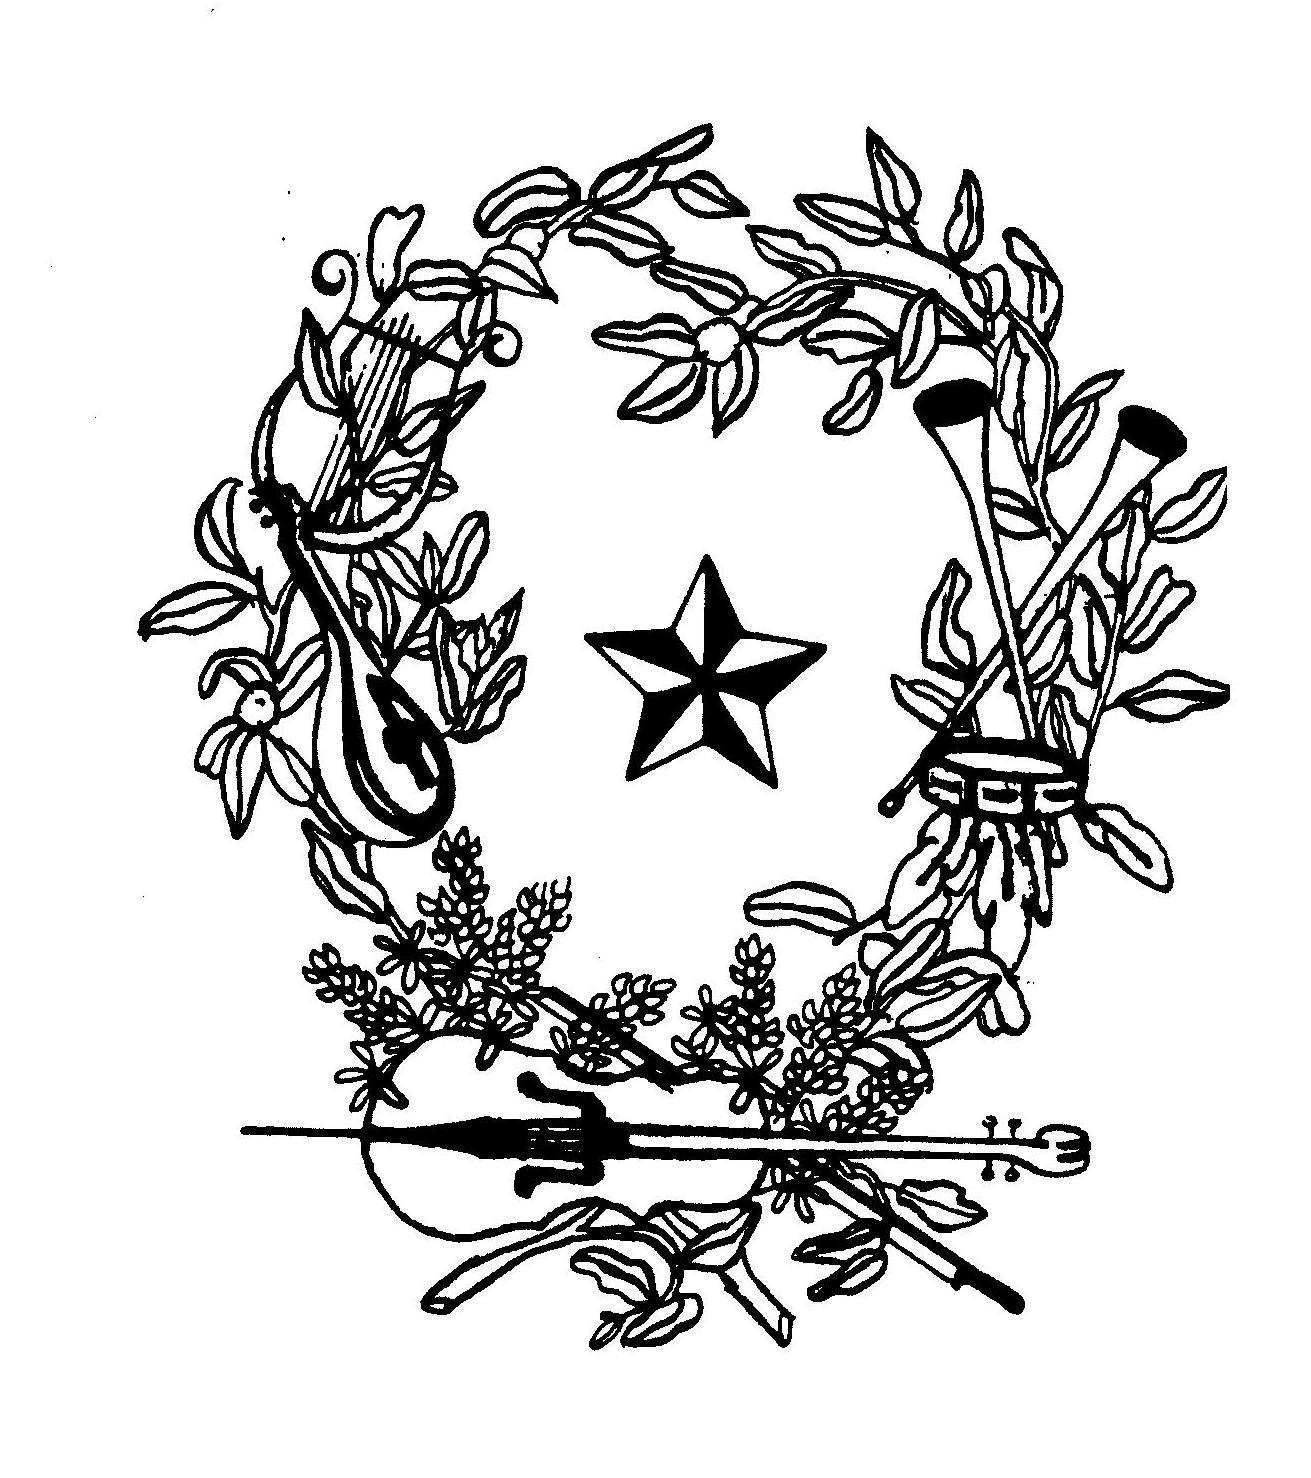 logo-without TASO name .JPG